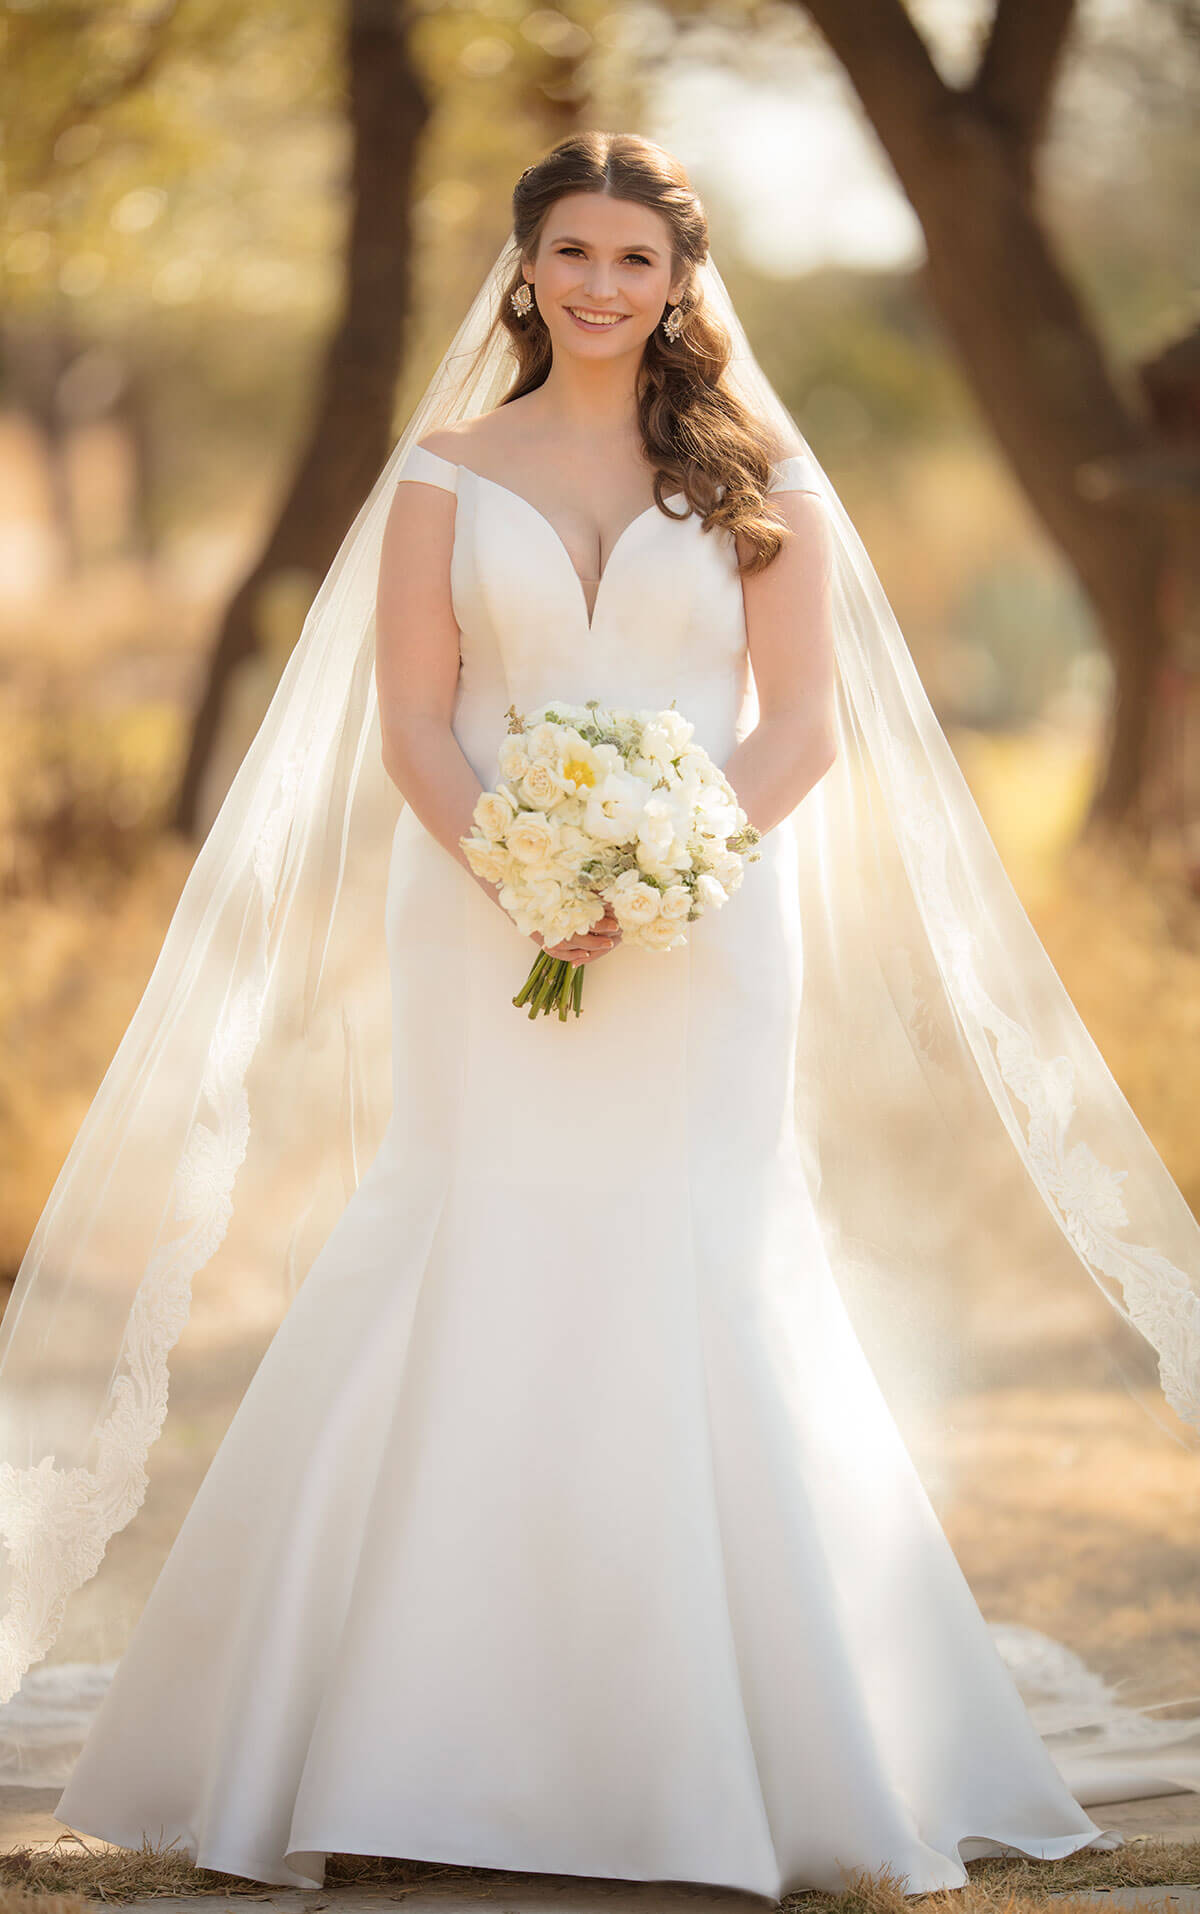 Plus Size Wedding Dresses in Jacksonville, FL